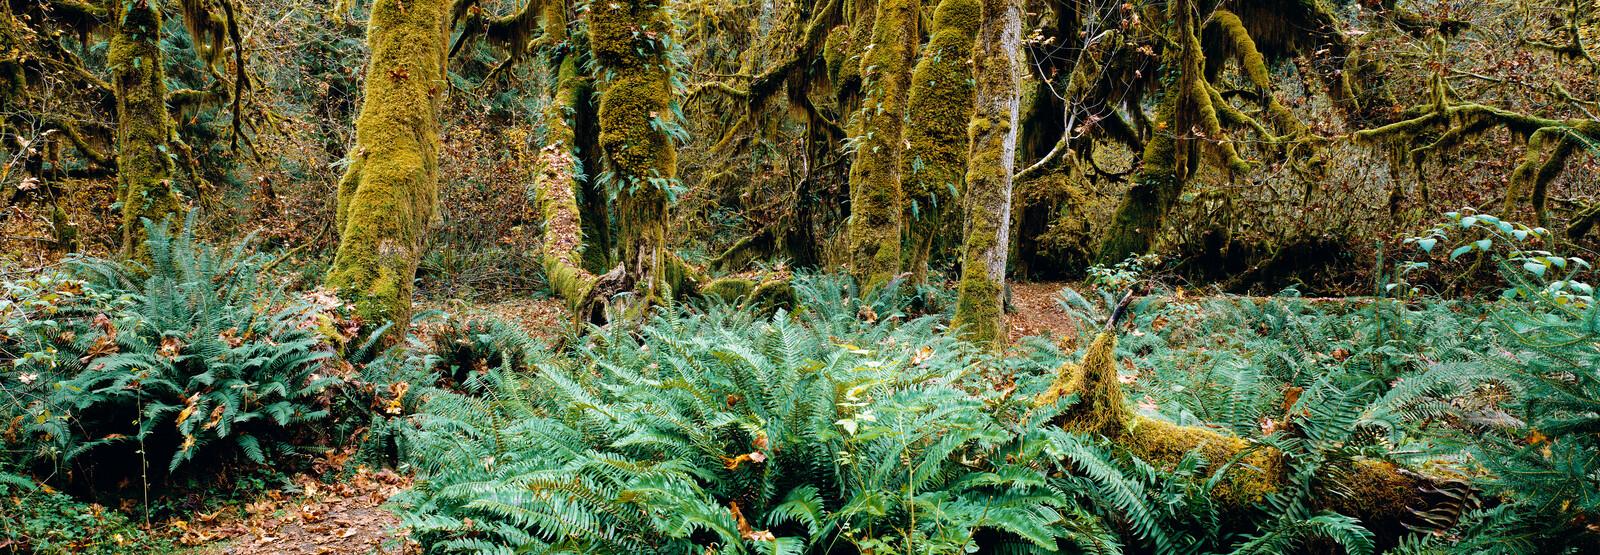 Rain Forest, Pacific Rim, Vancouver Island, British Columbia, Canada - Axel M. Mosler